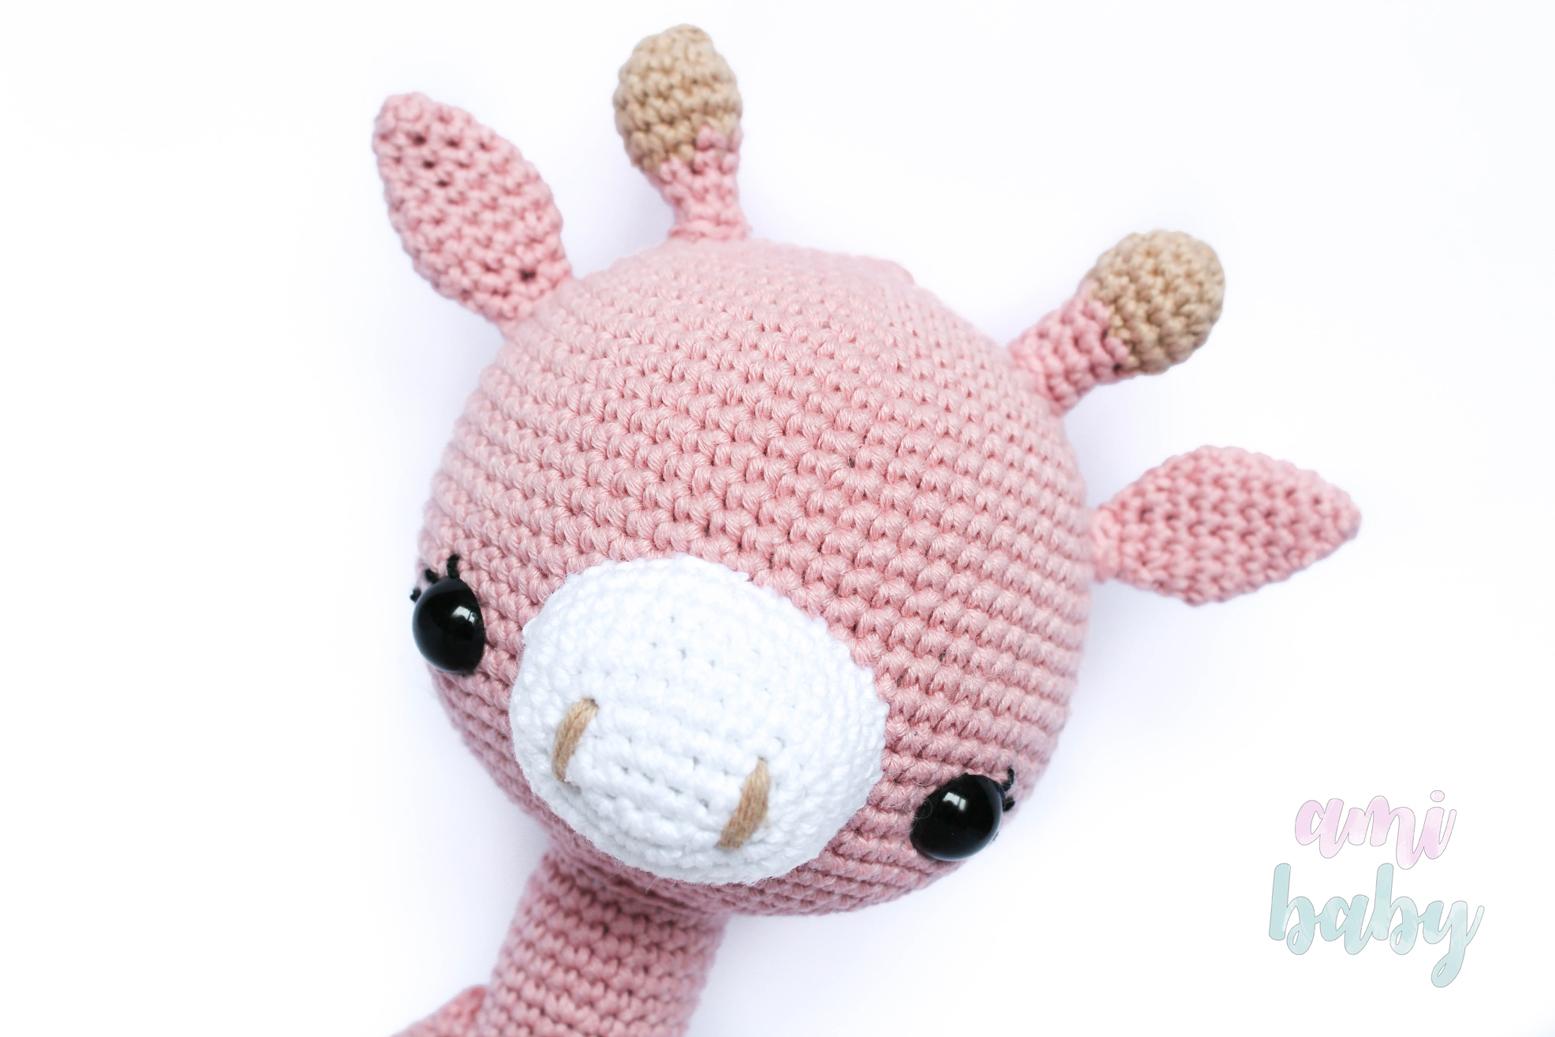 Amigurumis Para Bebes : Giraffe amigurumi for babies by storyland amis jirafa para bebés